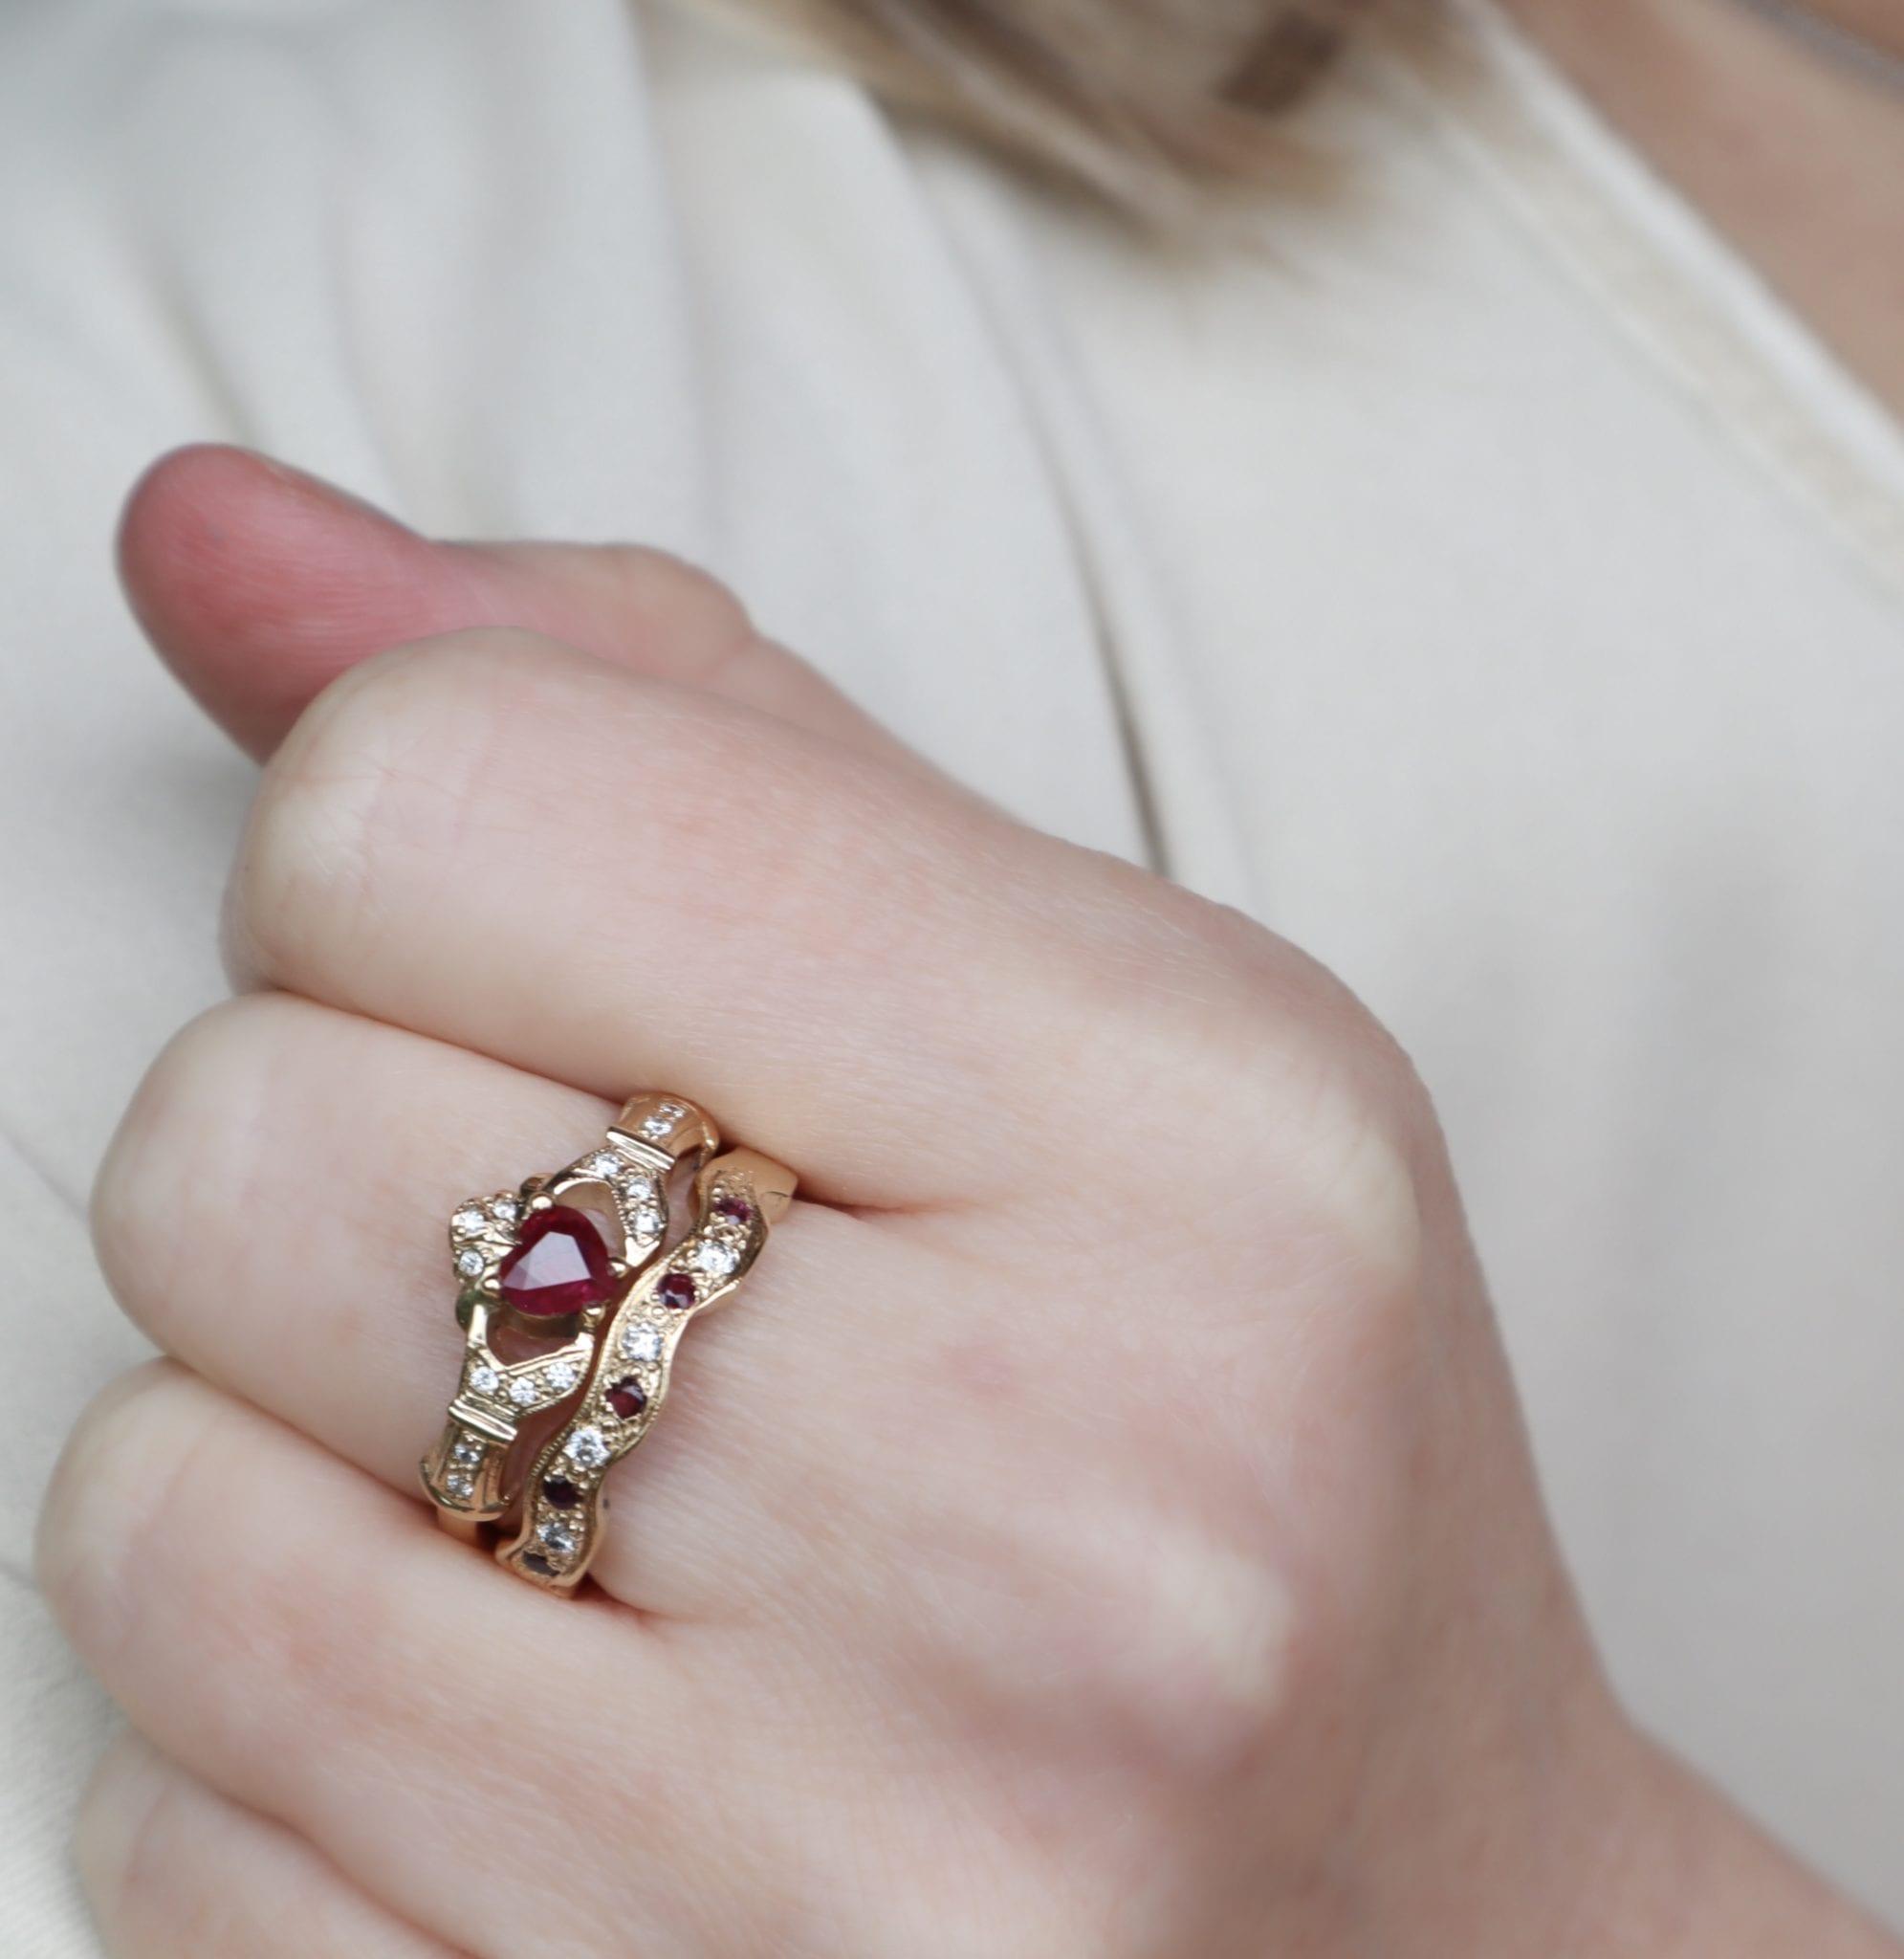 Claddagh Ring - Boru Jewelry